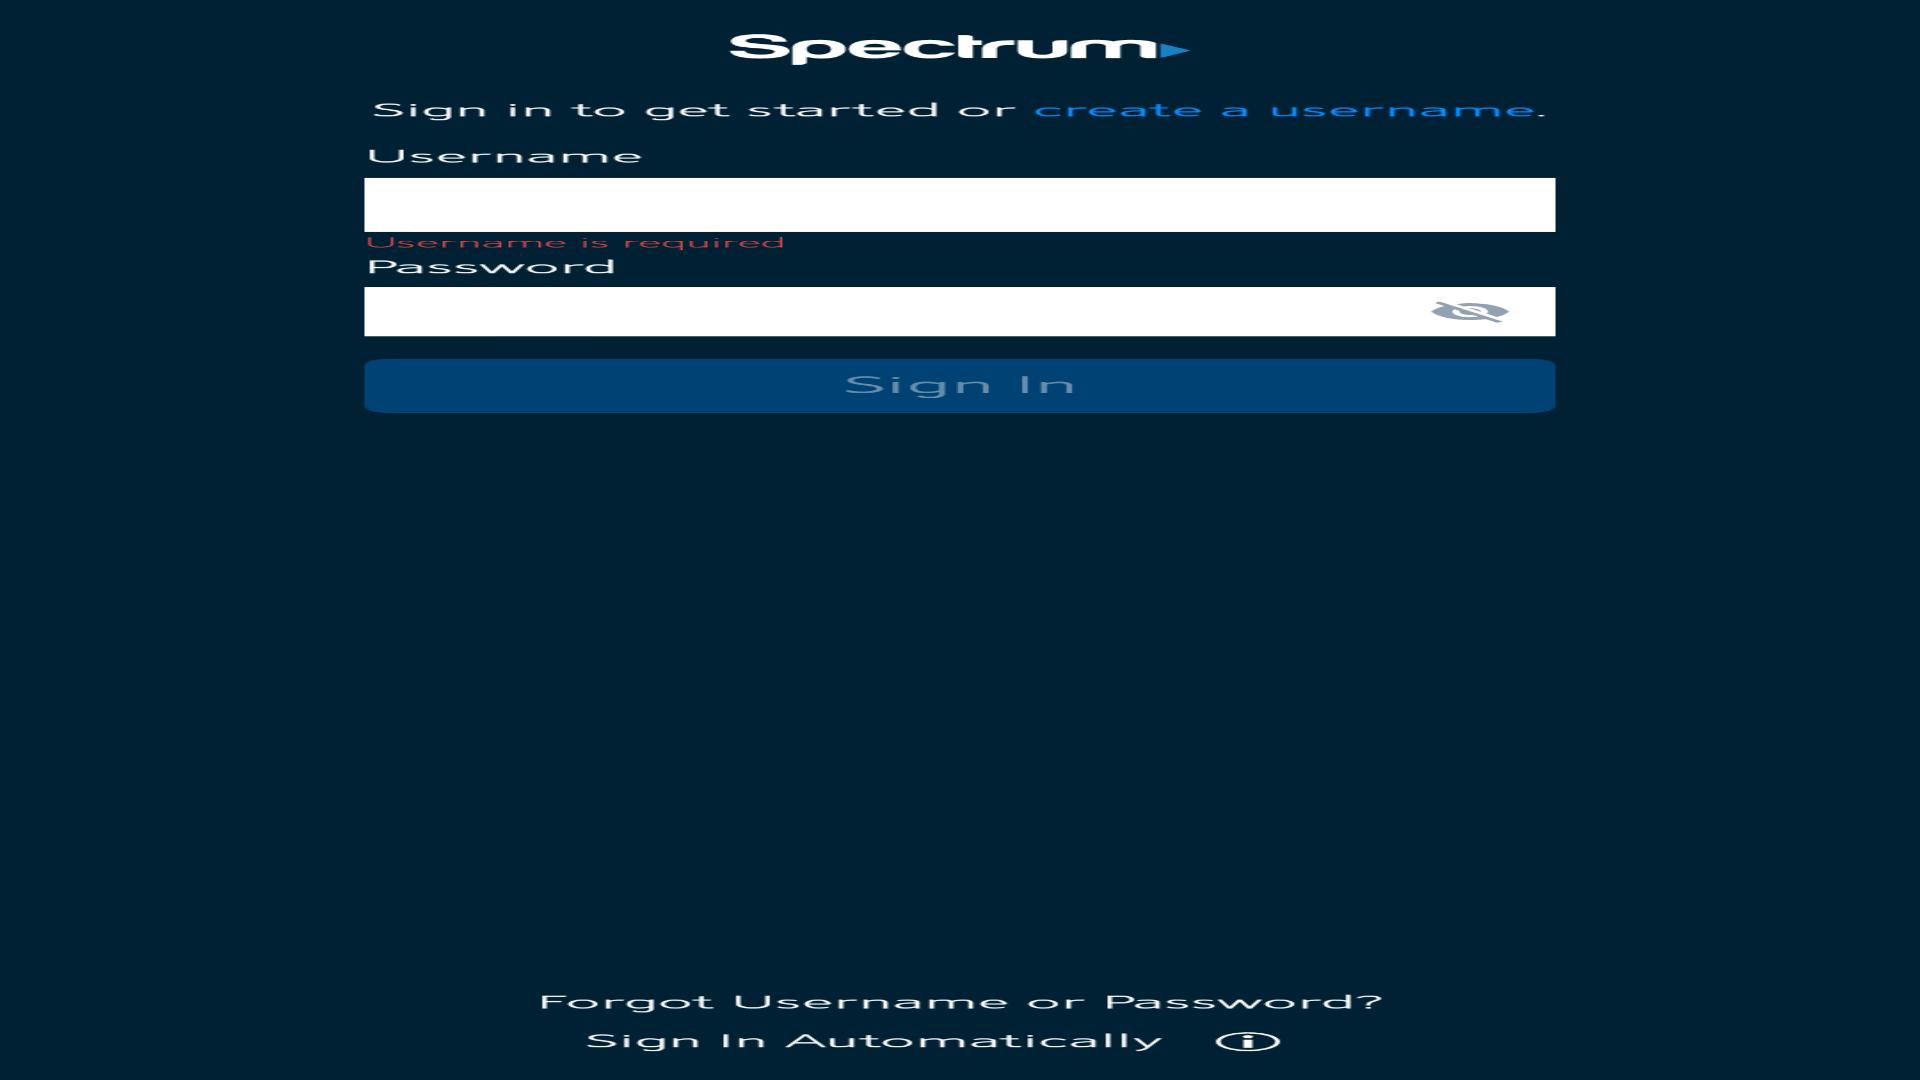 Spectrum-TV-App on Firestick using Downloader-6